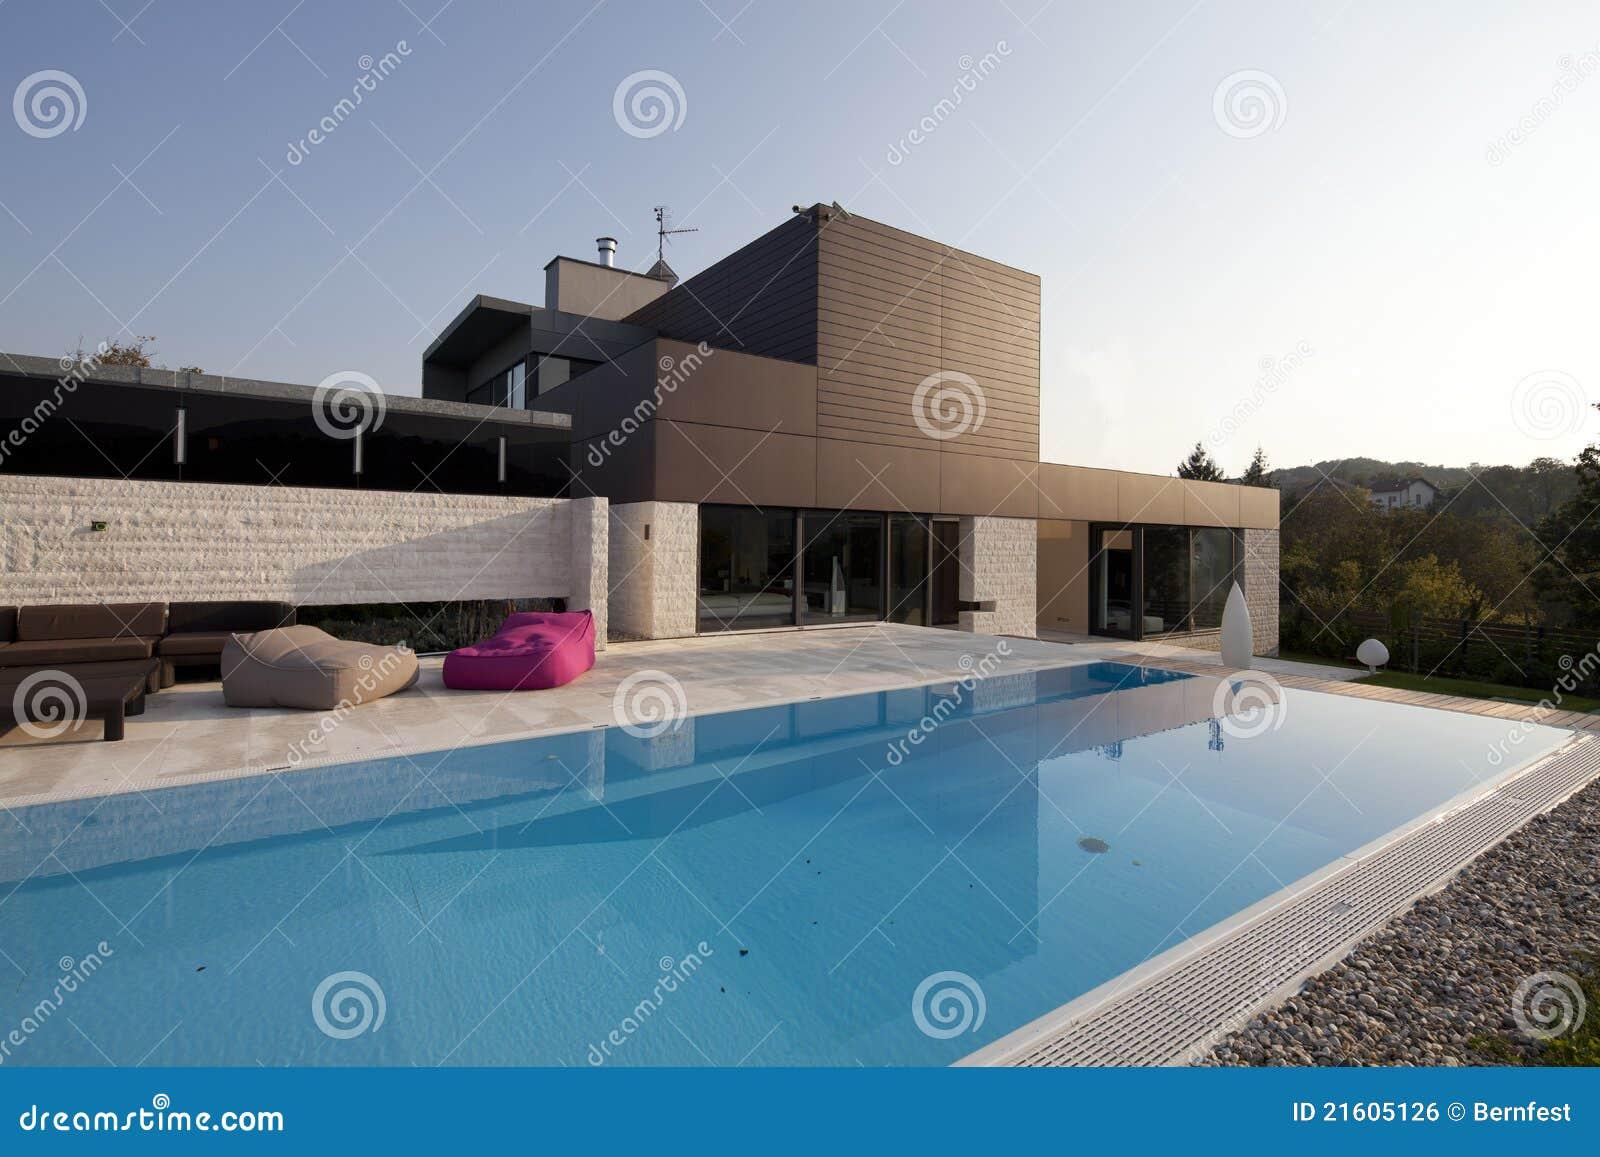 Casa moderna hermosa con la piscina foto de archivo for Casa moderna orari